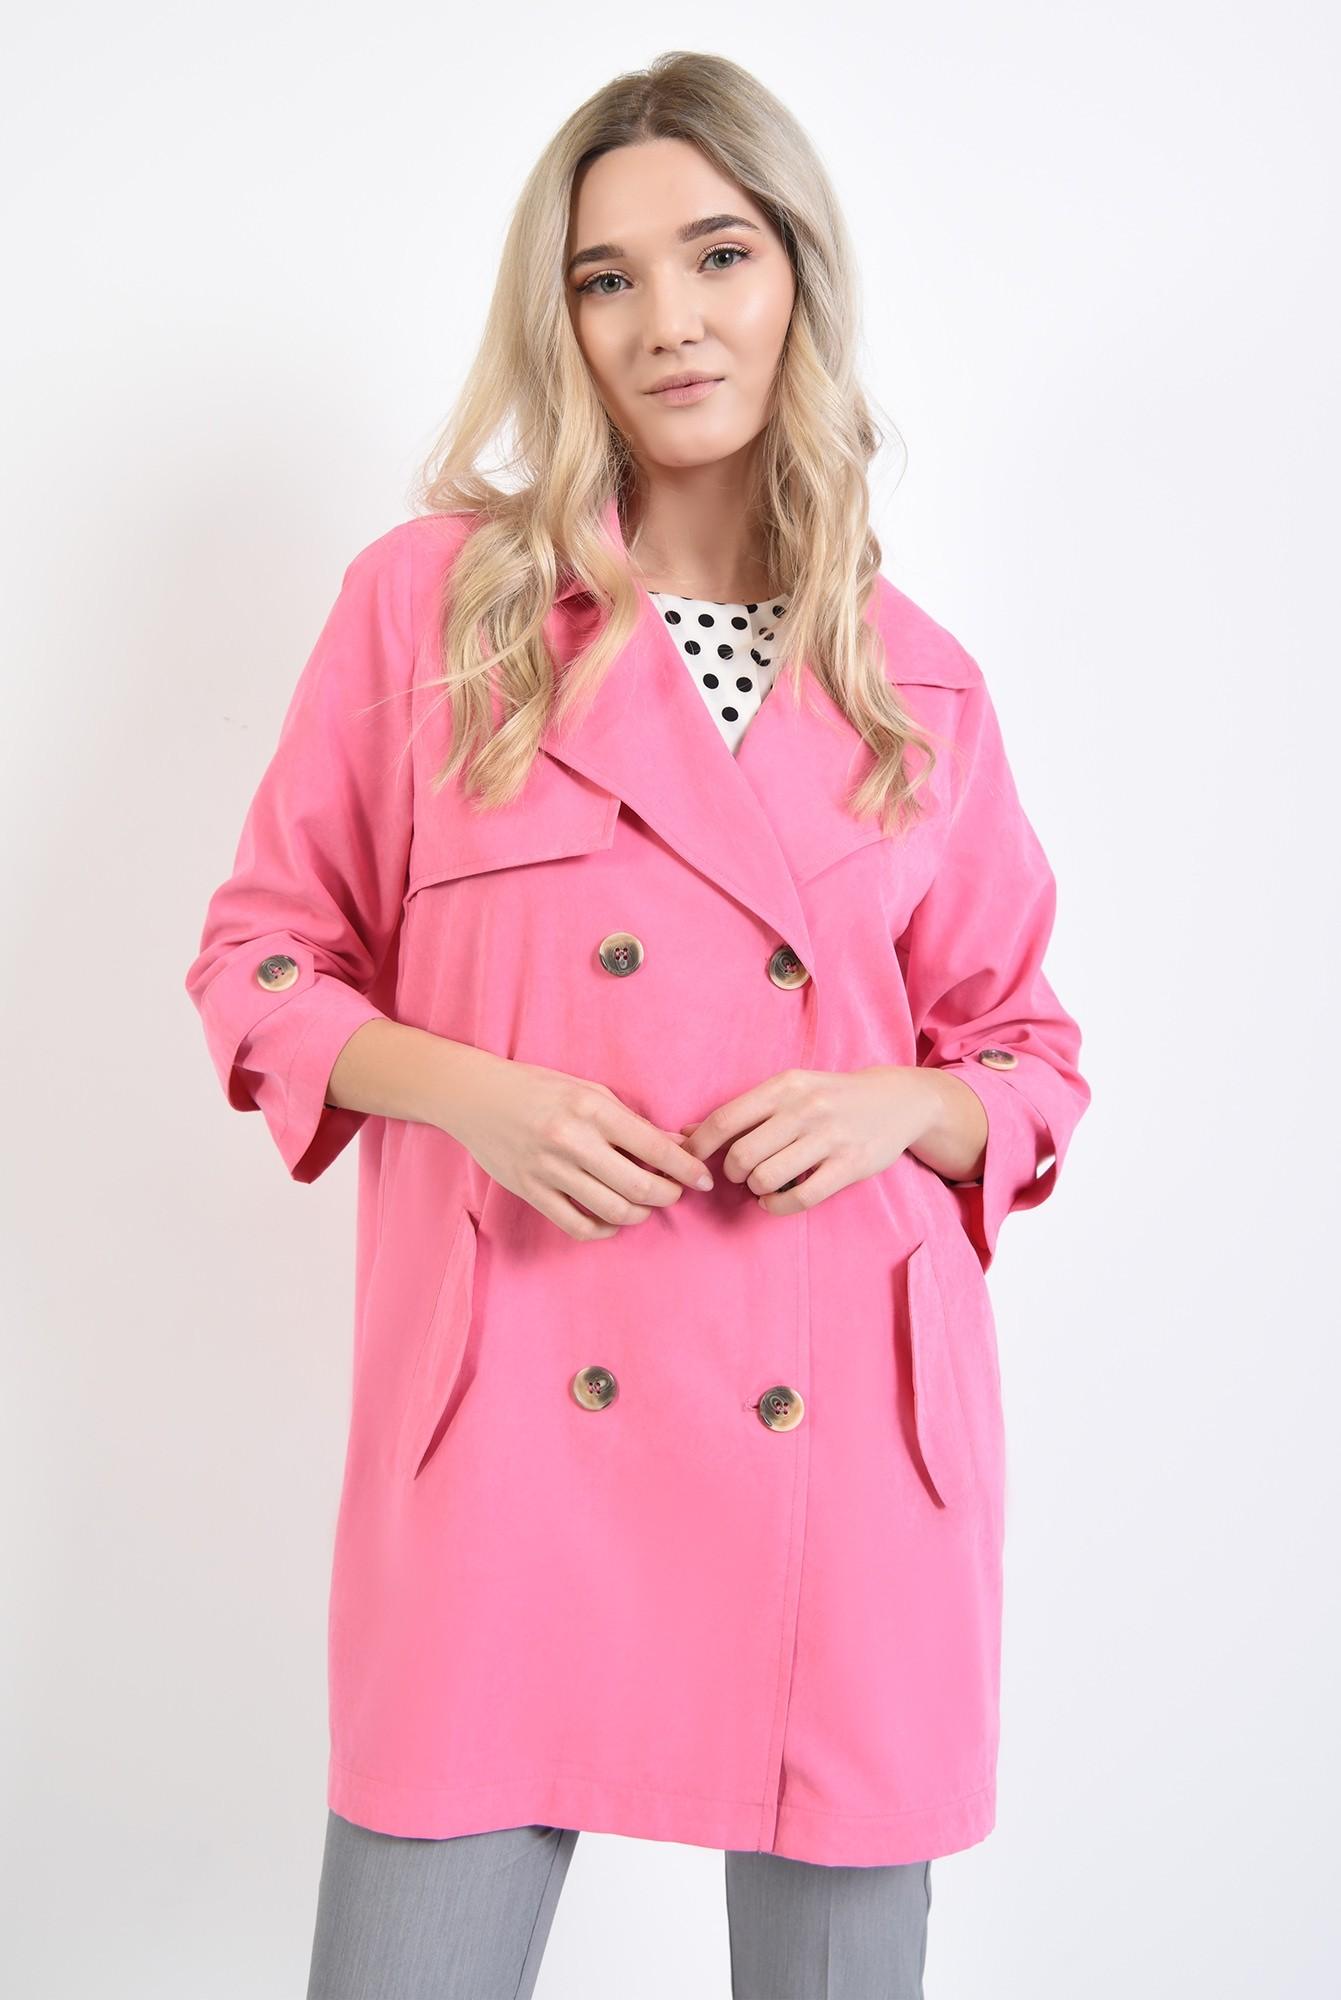 2 - jacheta roz, cu nasturi, cu revere, croi relaxat